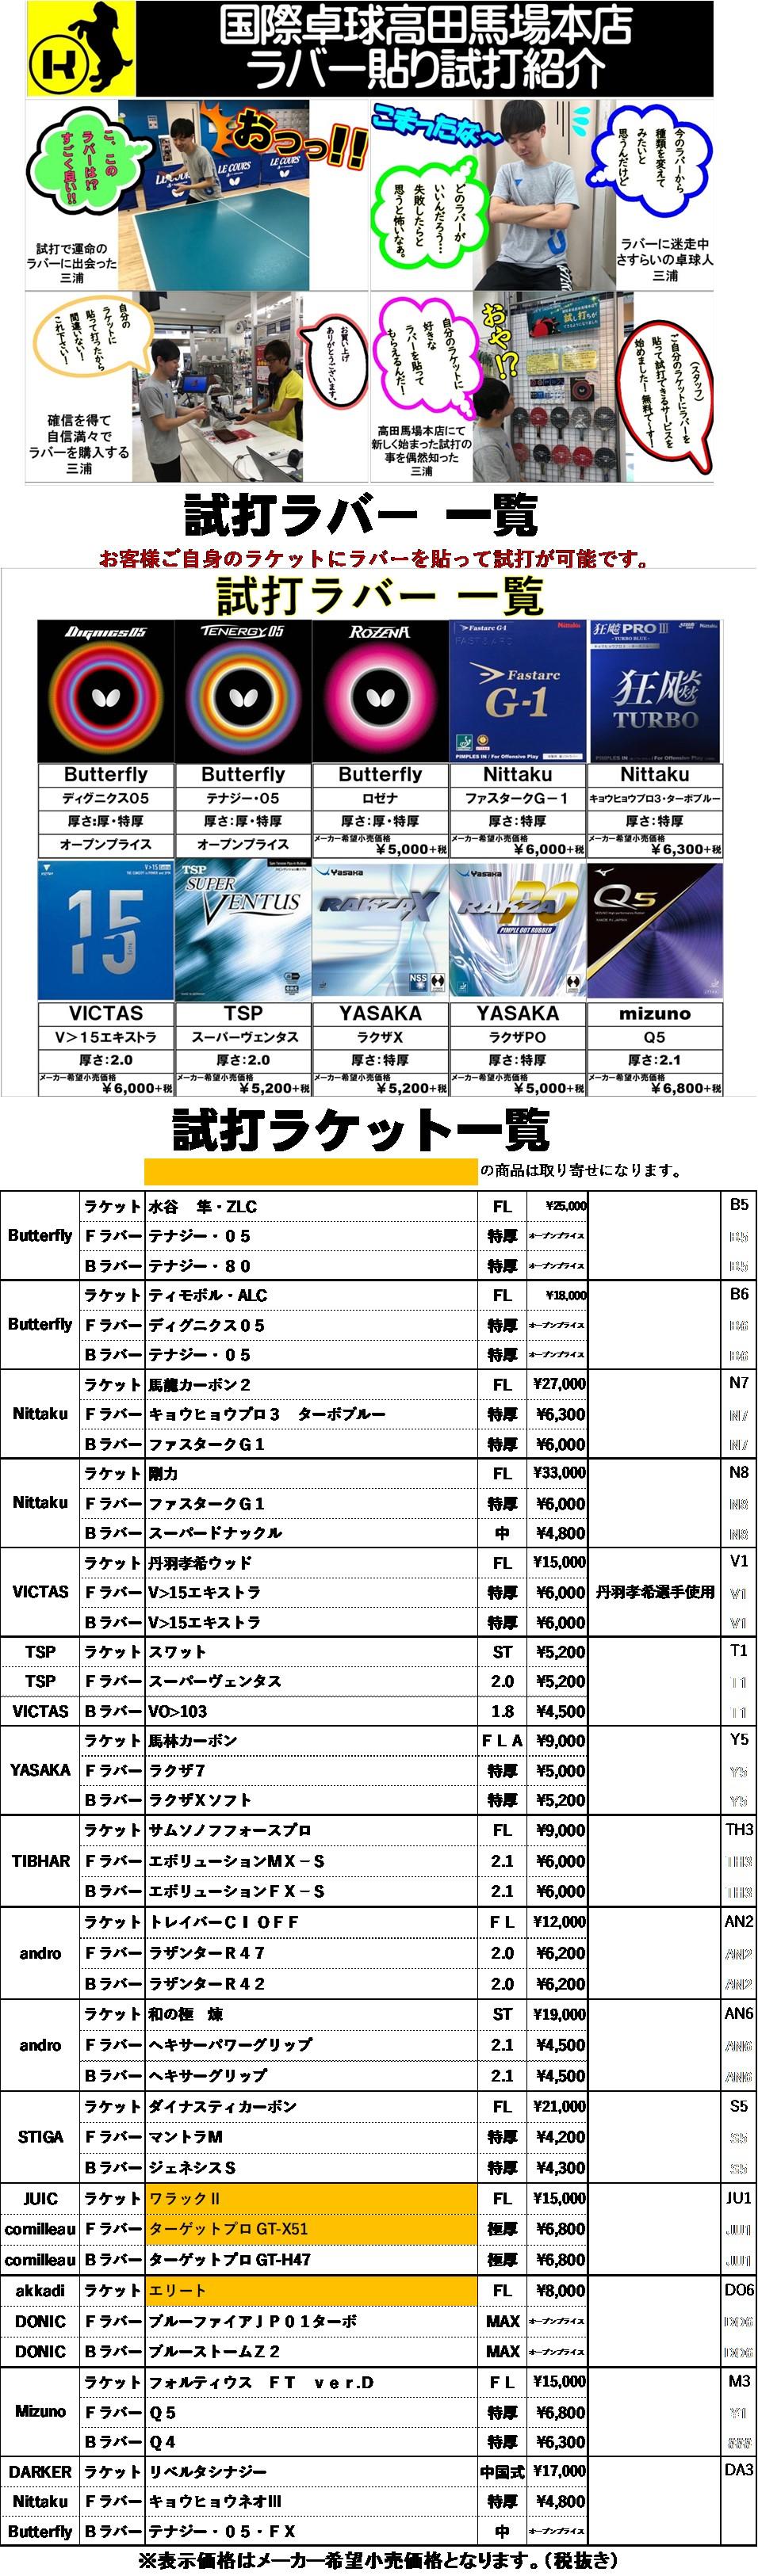 2019高田馬場店 試打会リスト